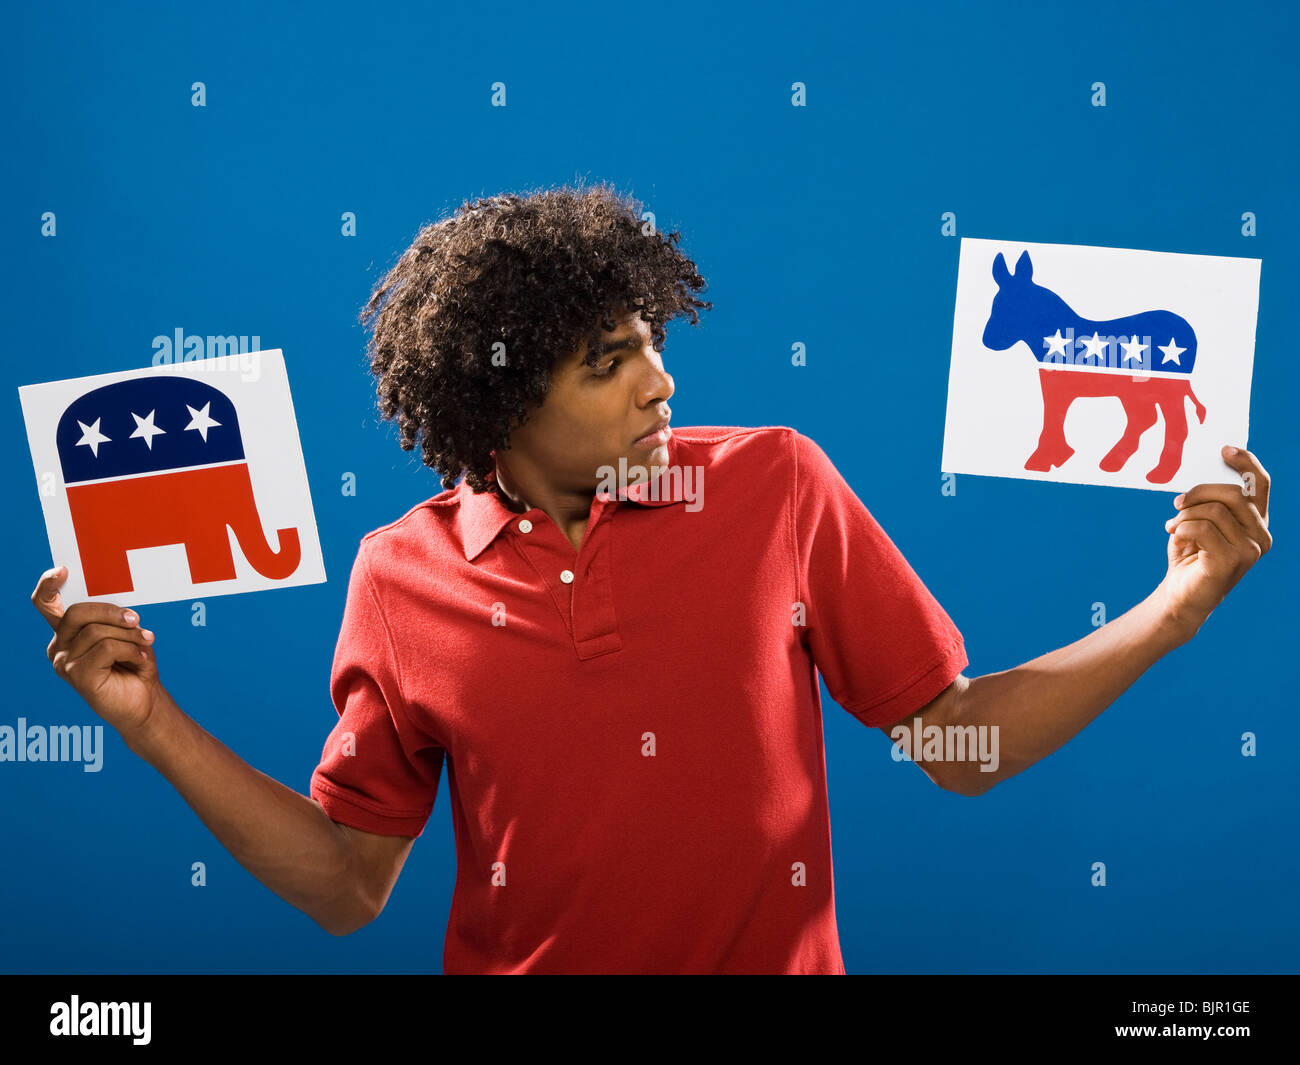 young man choosing between political parties. - Stock Image